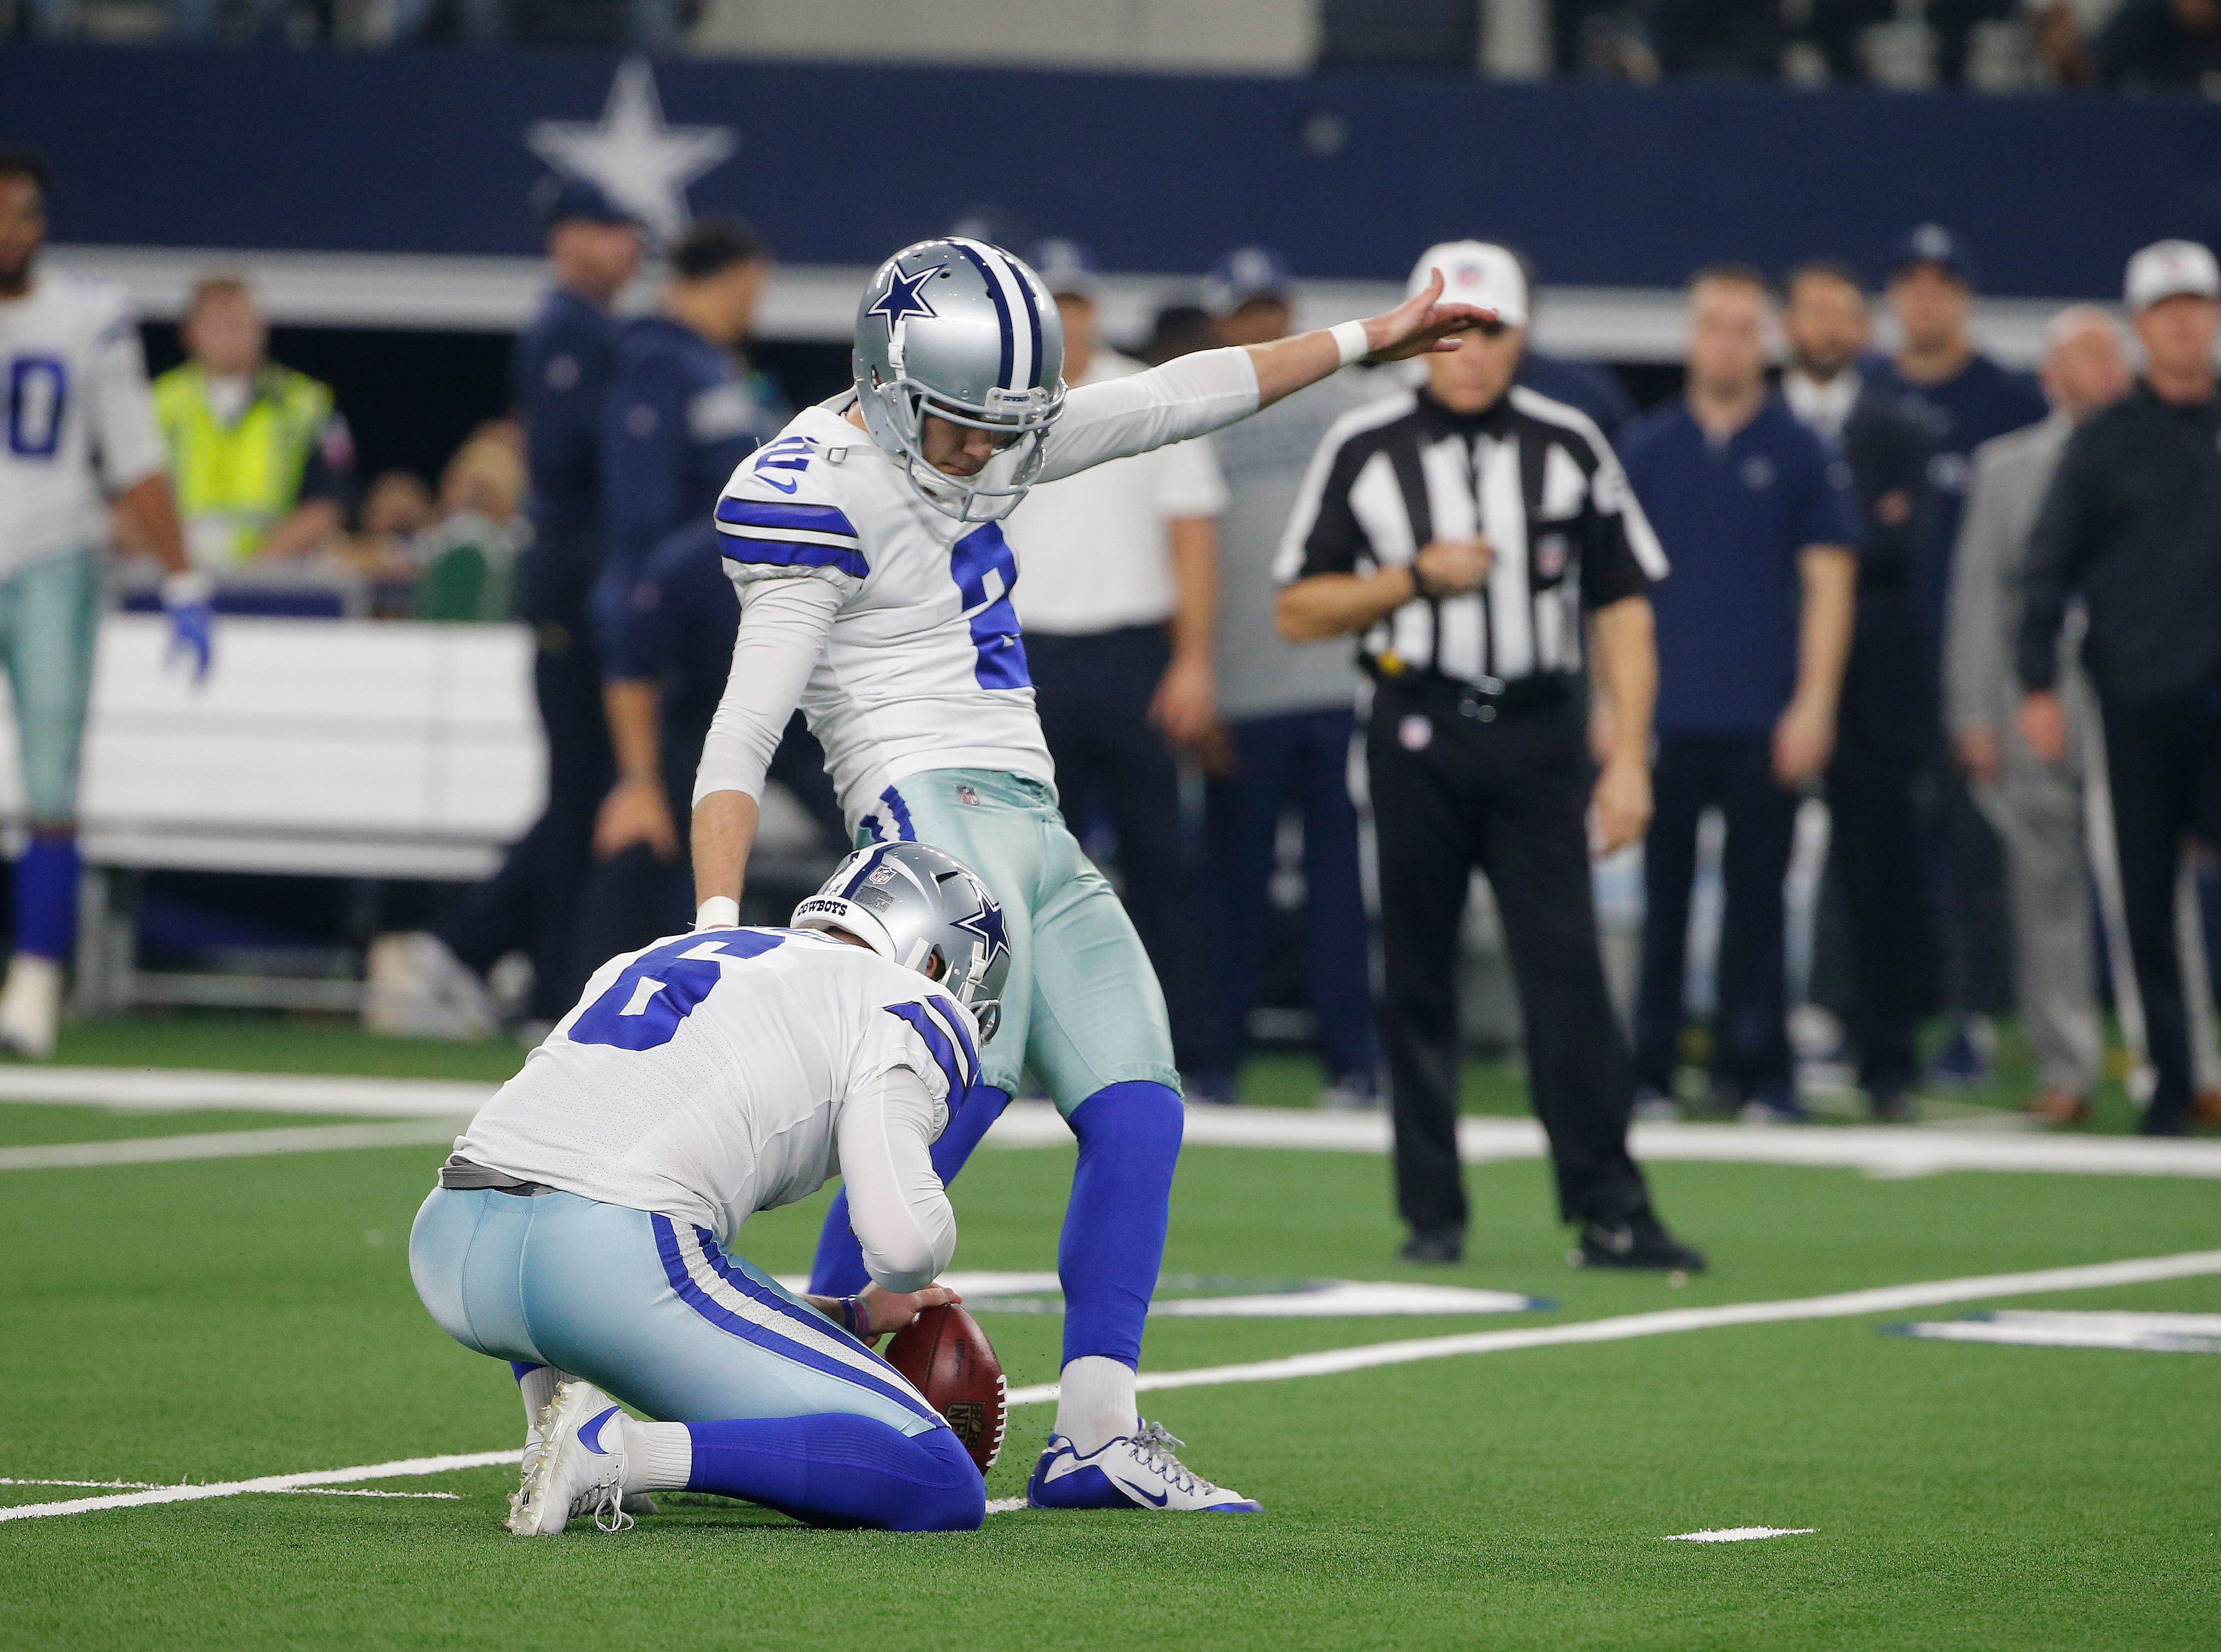 Dallas Cowboys kicker Brett Maher (2) kicks a 39-yard field goal against the Seattle Seahawks first half of the NFC wild-card NFL football game in Arlington, Texas, Saturday, Jan. 5, 2019. (AP Photo/Michael Ainsworth)